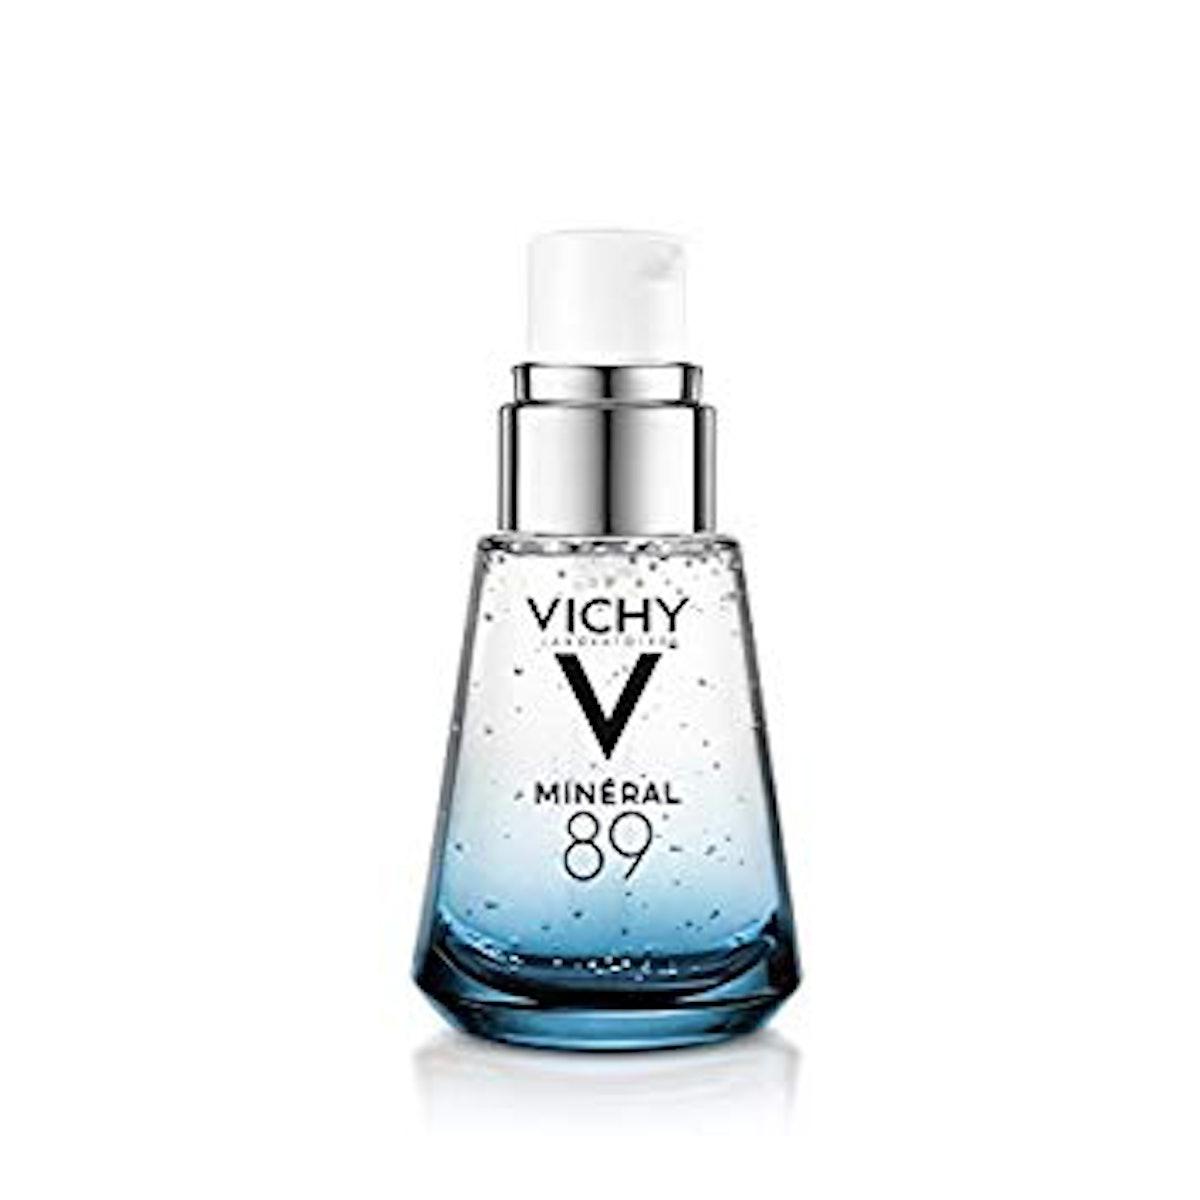 Vichy Minéral 89 Daily Skin Booster Serum